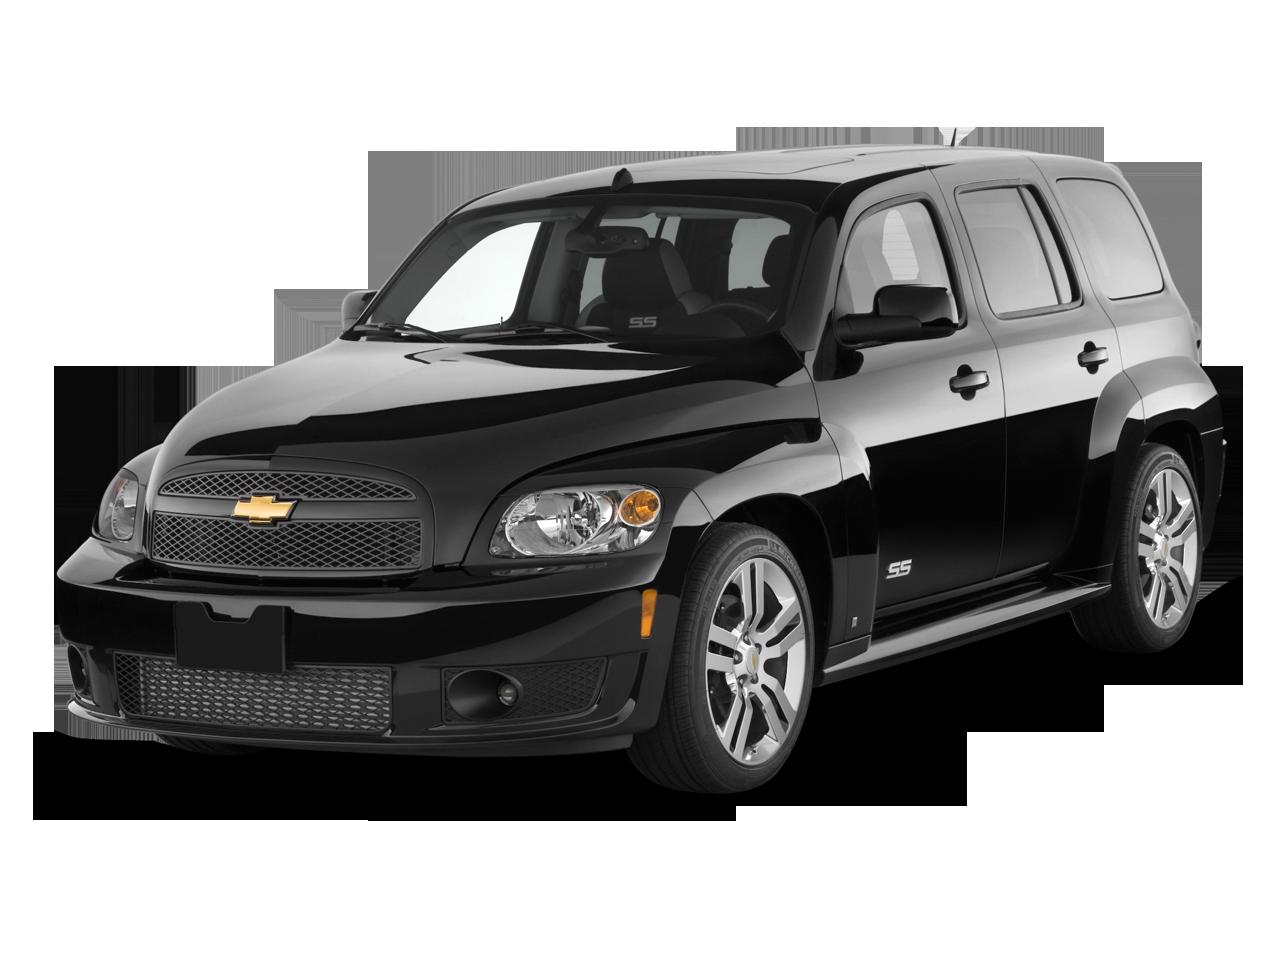 2008 Chevrolet HHR Panel FWD